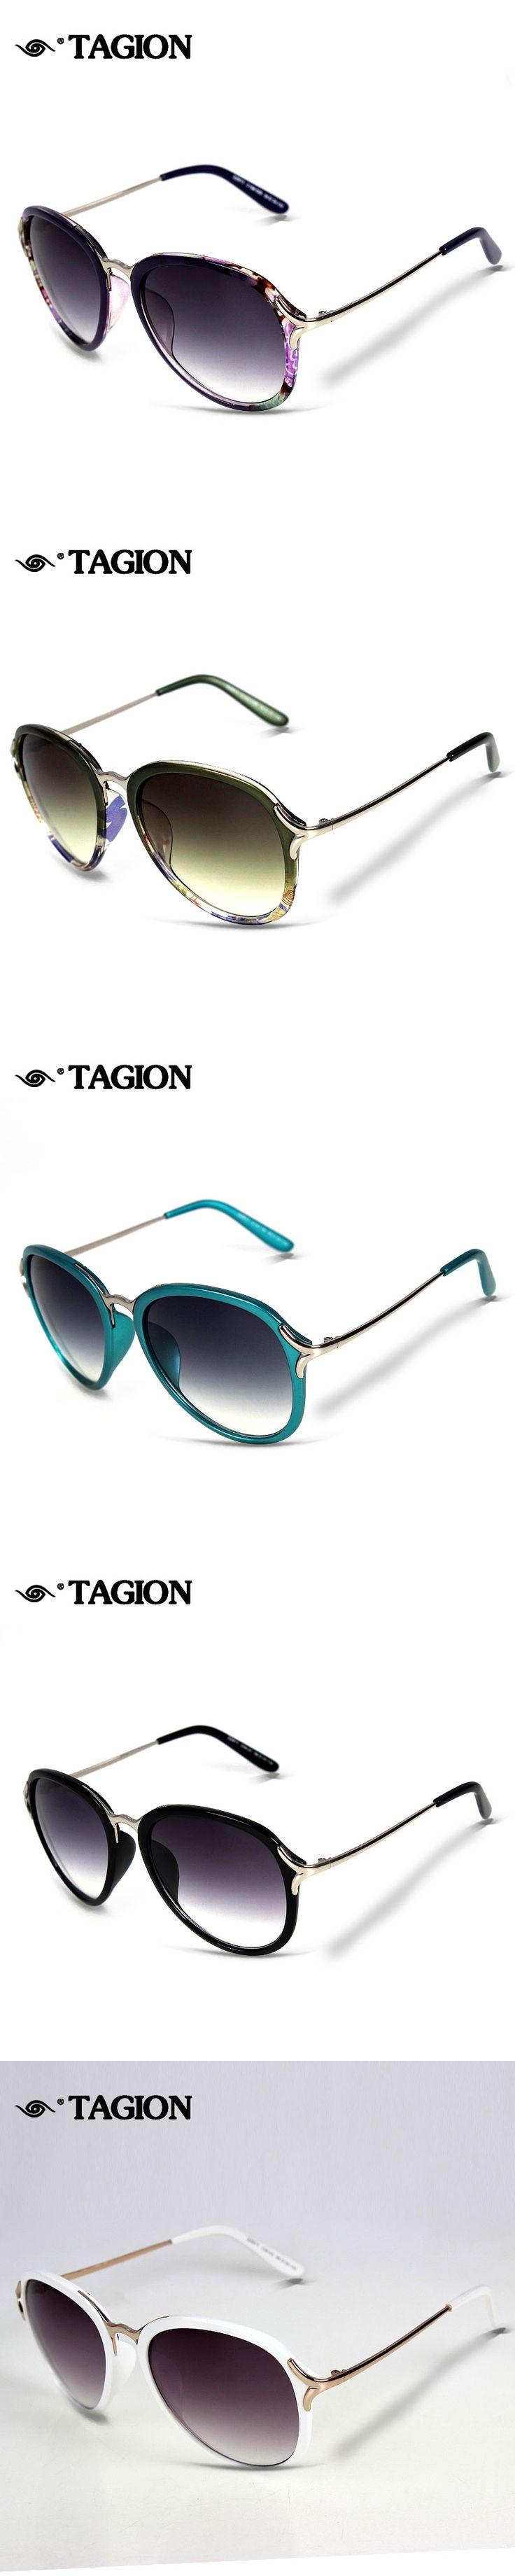 2016 New Arrival Women Sunglasses UV400 Protection Female Sun Glasses Gafas De Sol Sunglasses Women Brand Designer 32911A